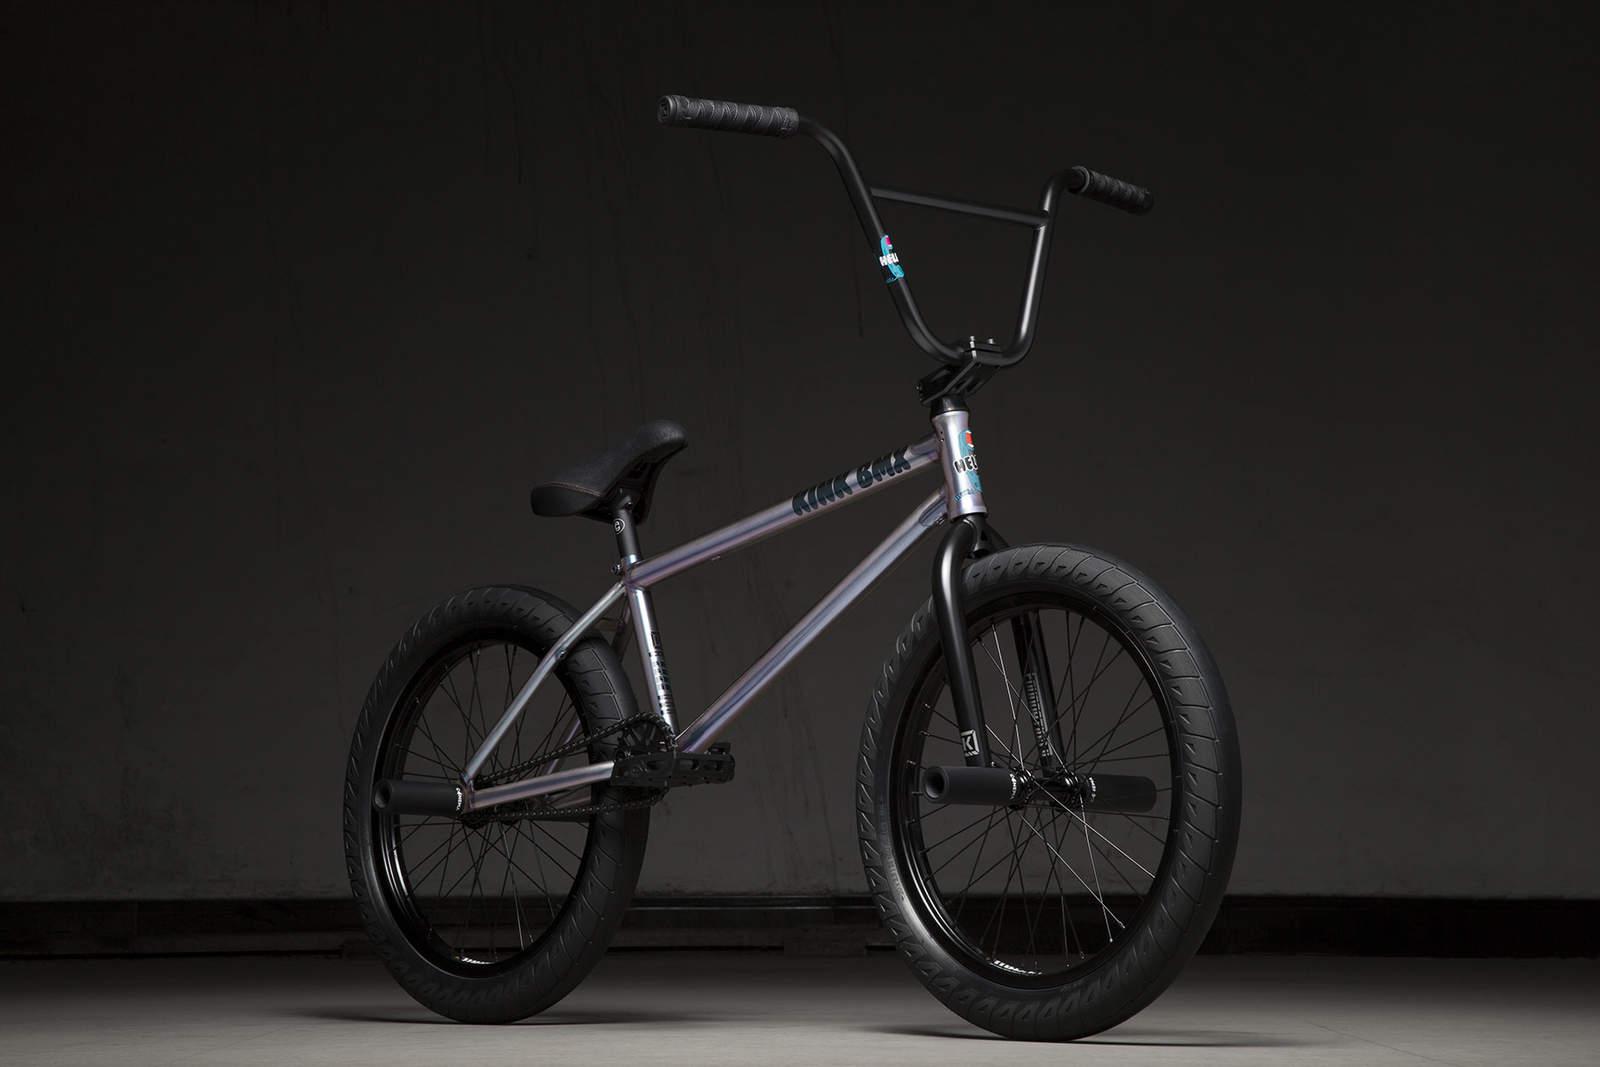 https://s3.amazonaws.com/uploads.bmxmuseum.com/user-images/199820/bikes_20_williams_k490raw20_3q5d17d0dd23.jpg